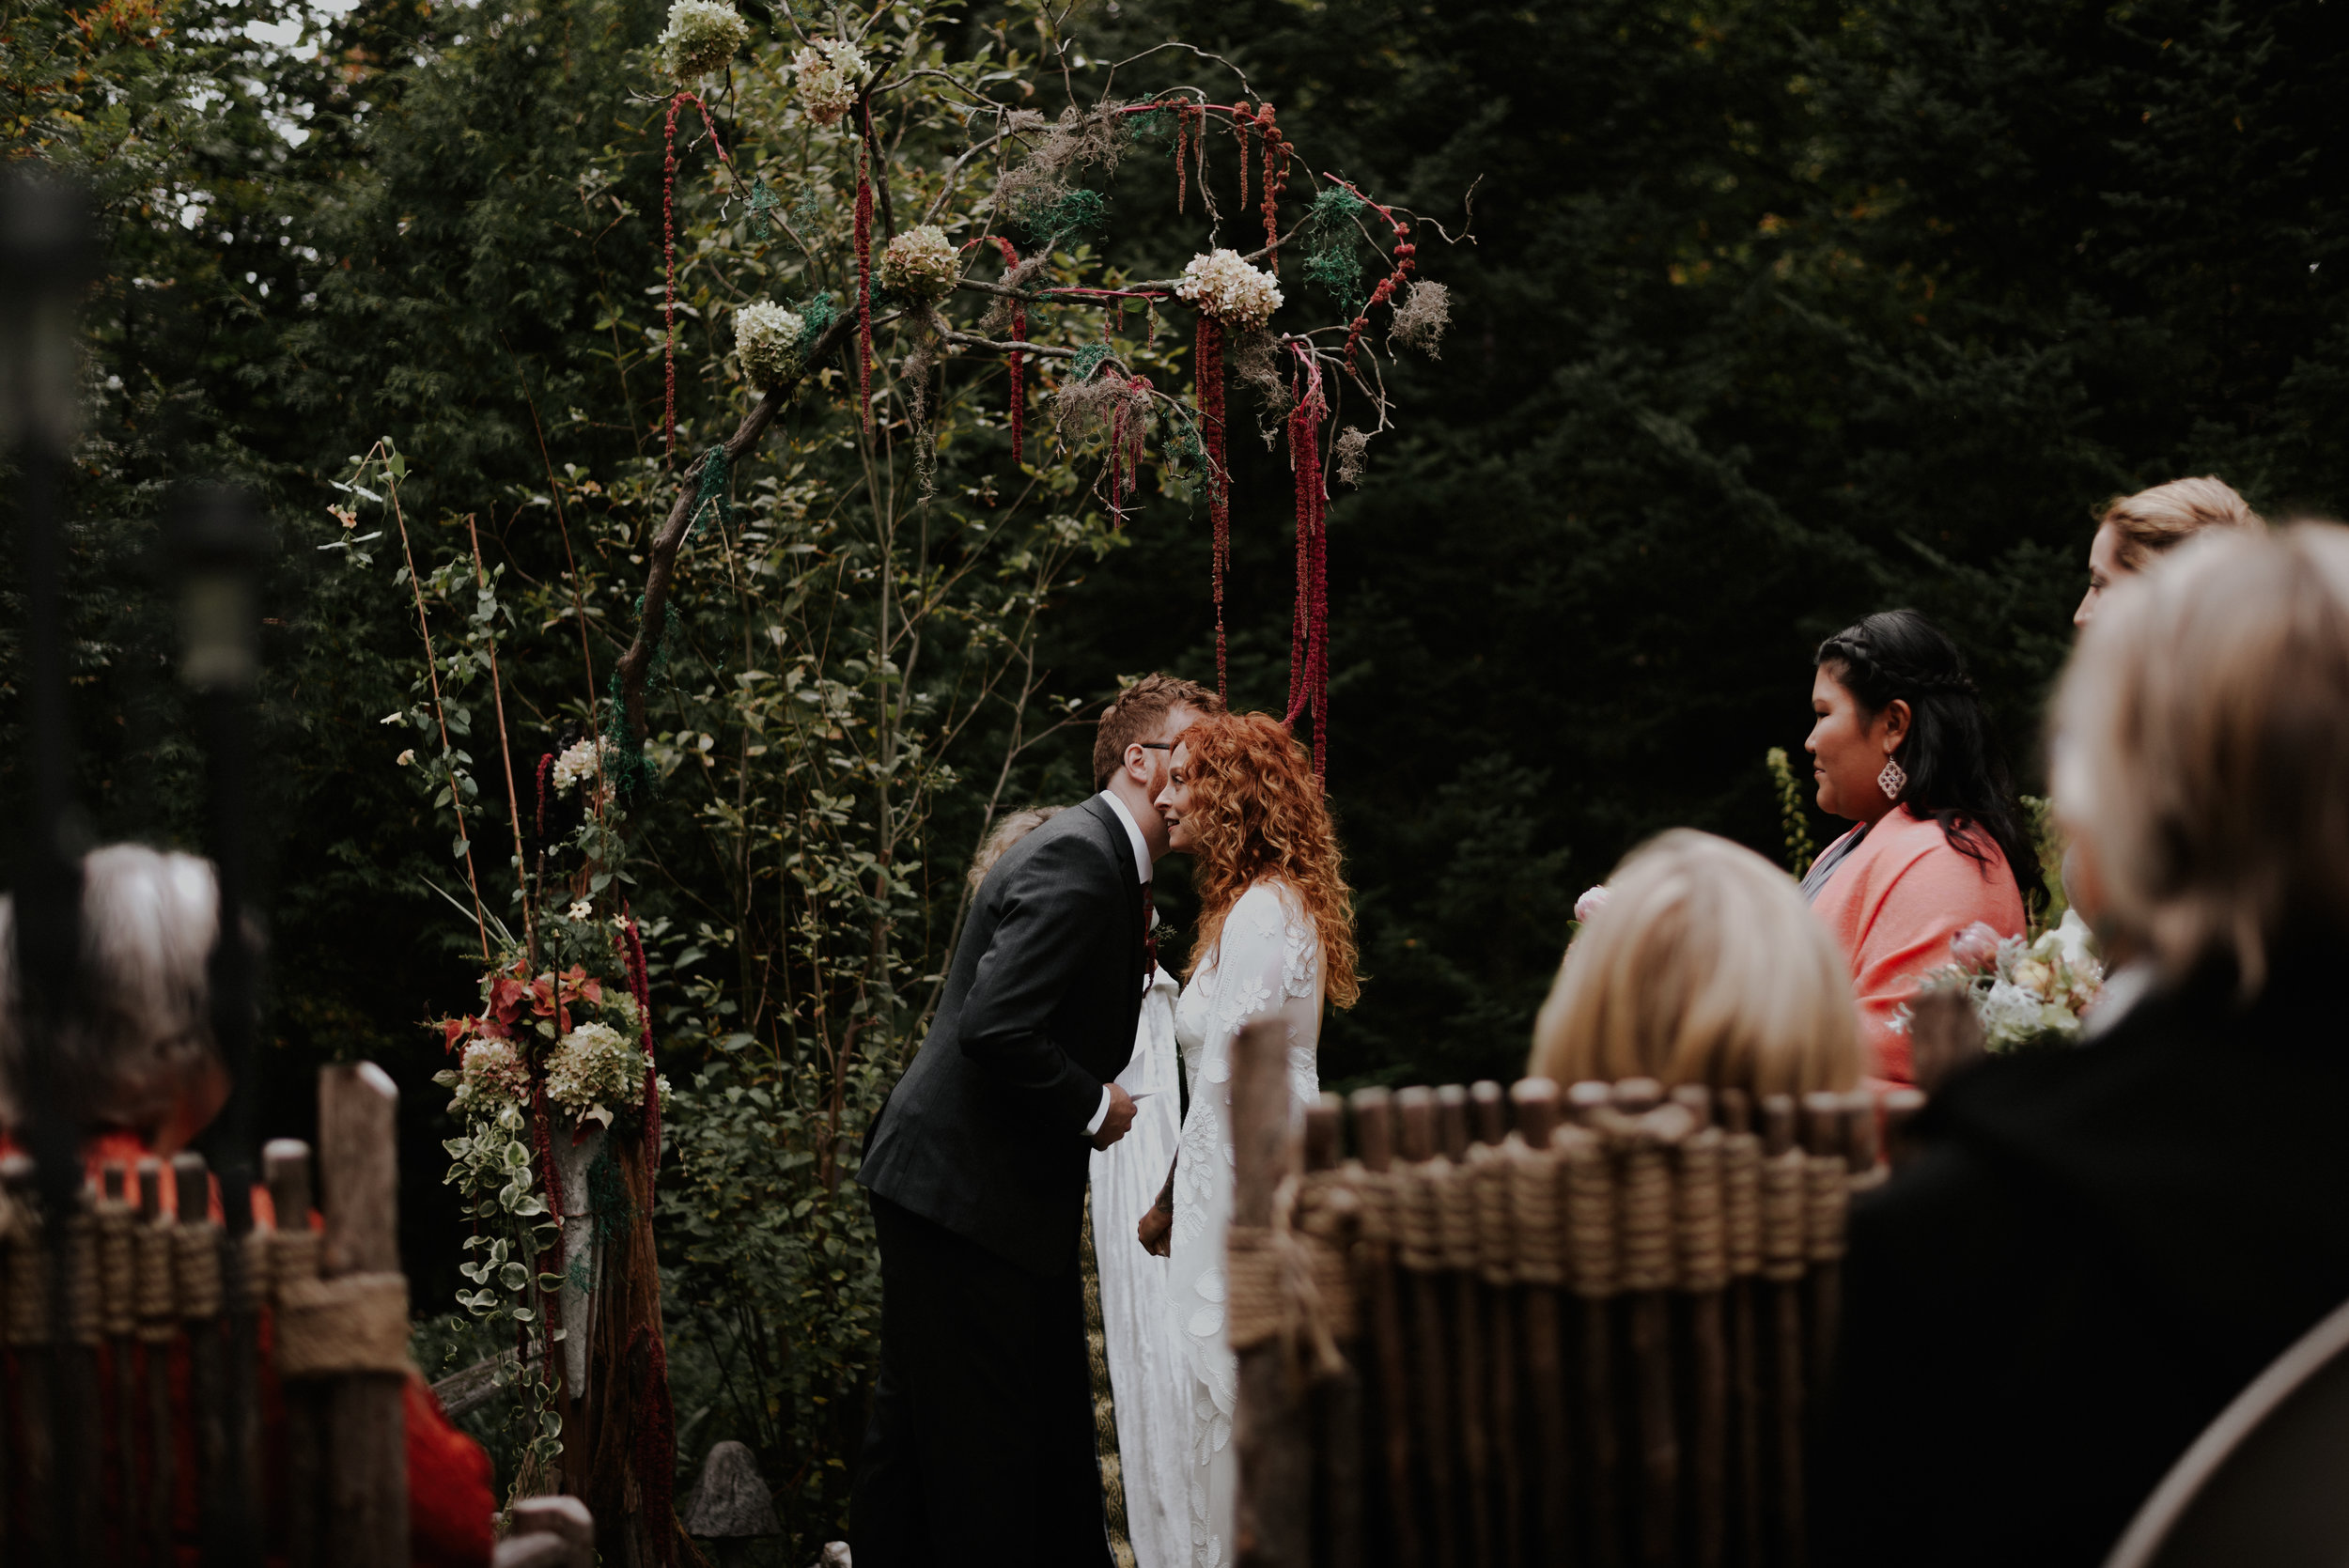 wildsoulsstudio-woodland-intimate-garden-newengland-wedding-lake willoughby-88.jpg